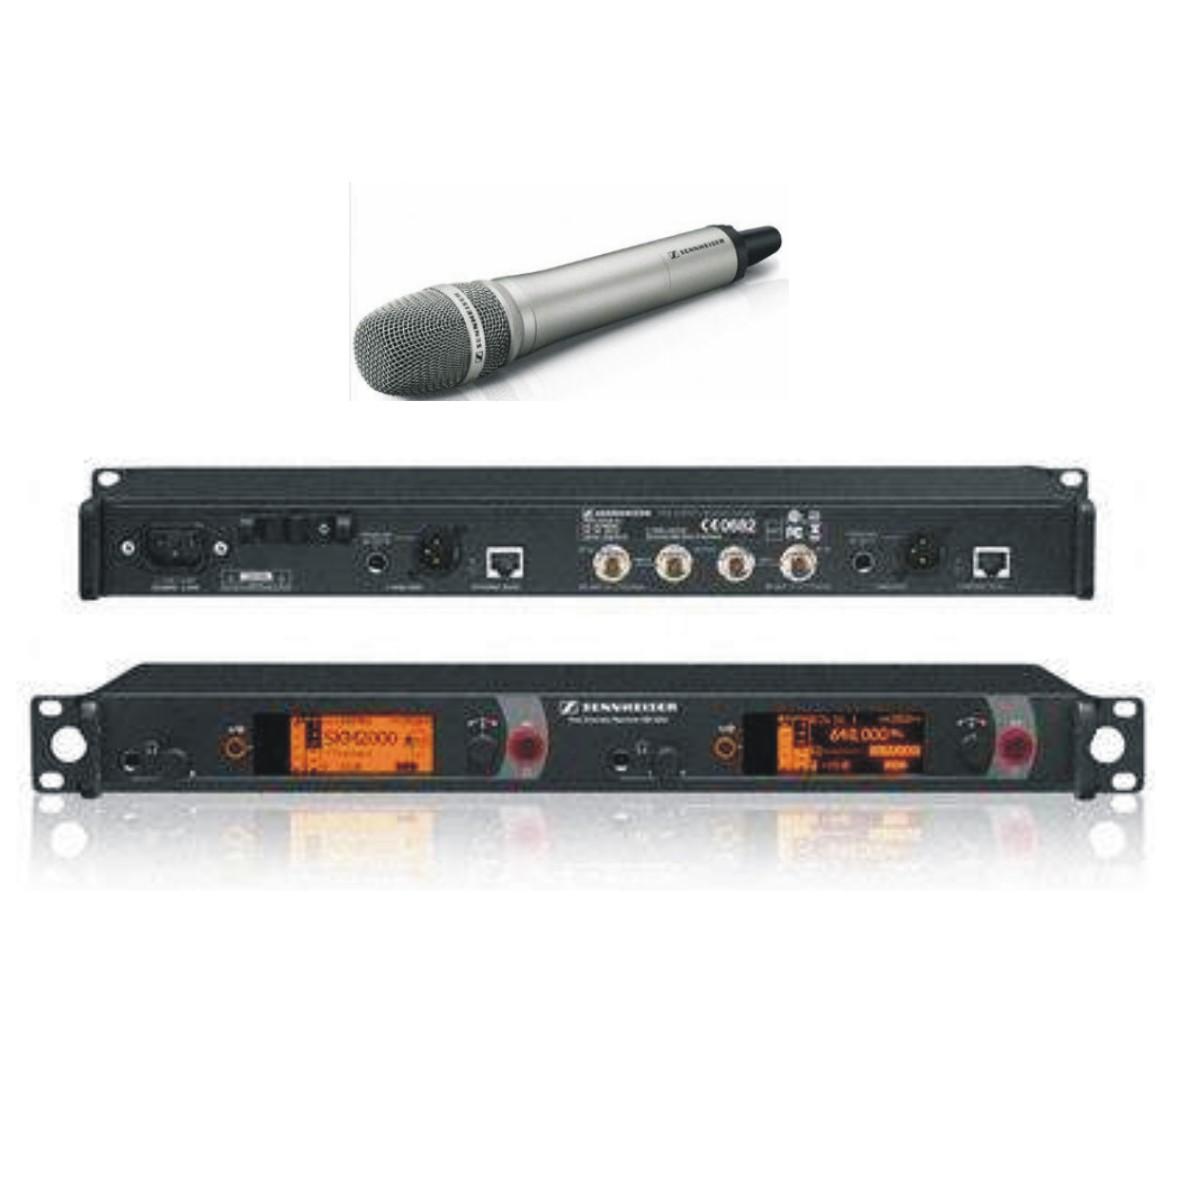 EM2050 SKM2000 无线话筒系统